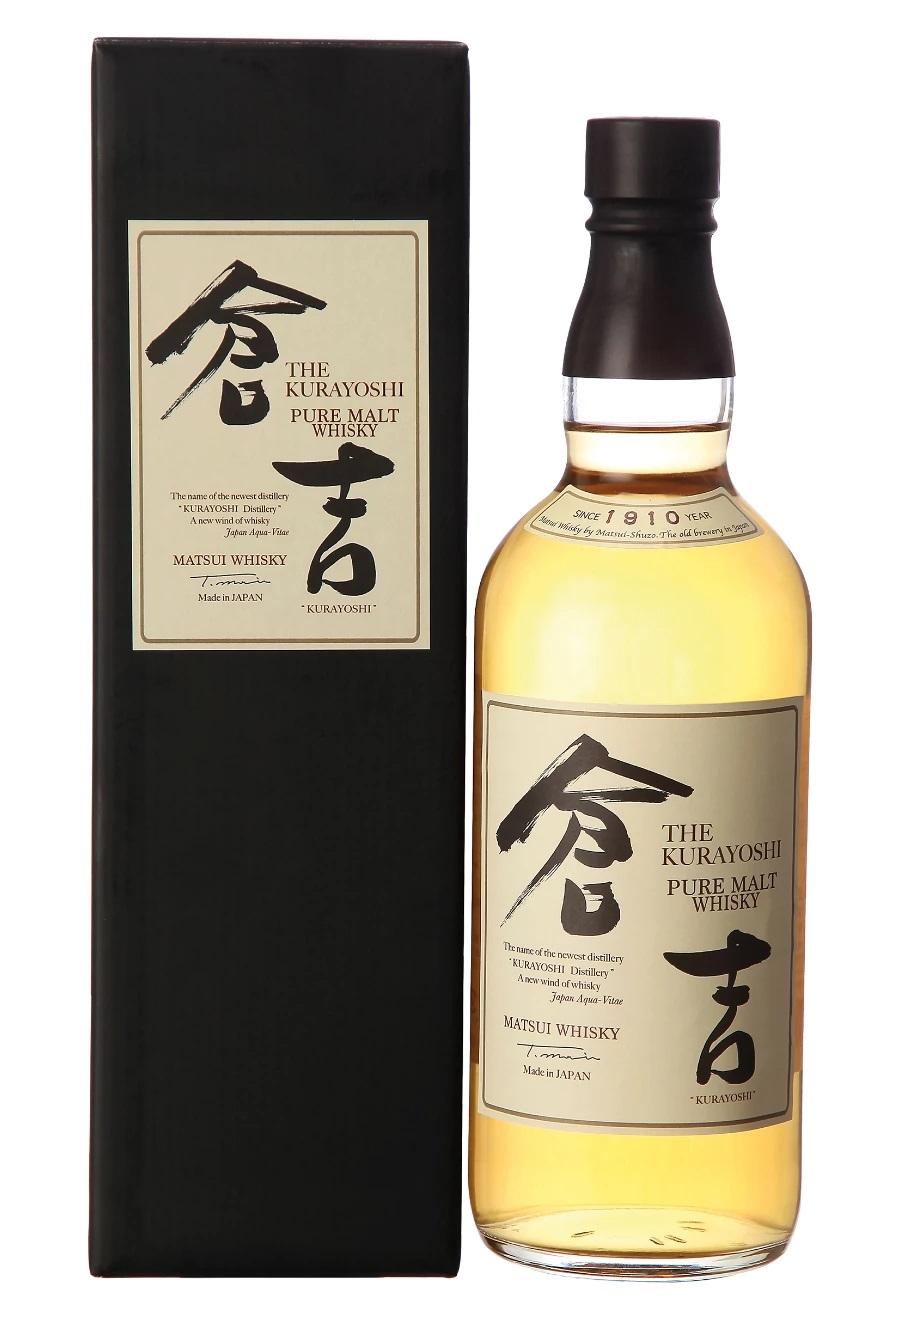 Matsui Whisky Kurayoshi Pure Malt Japanese Whisky, 43%, 0,7l